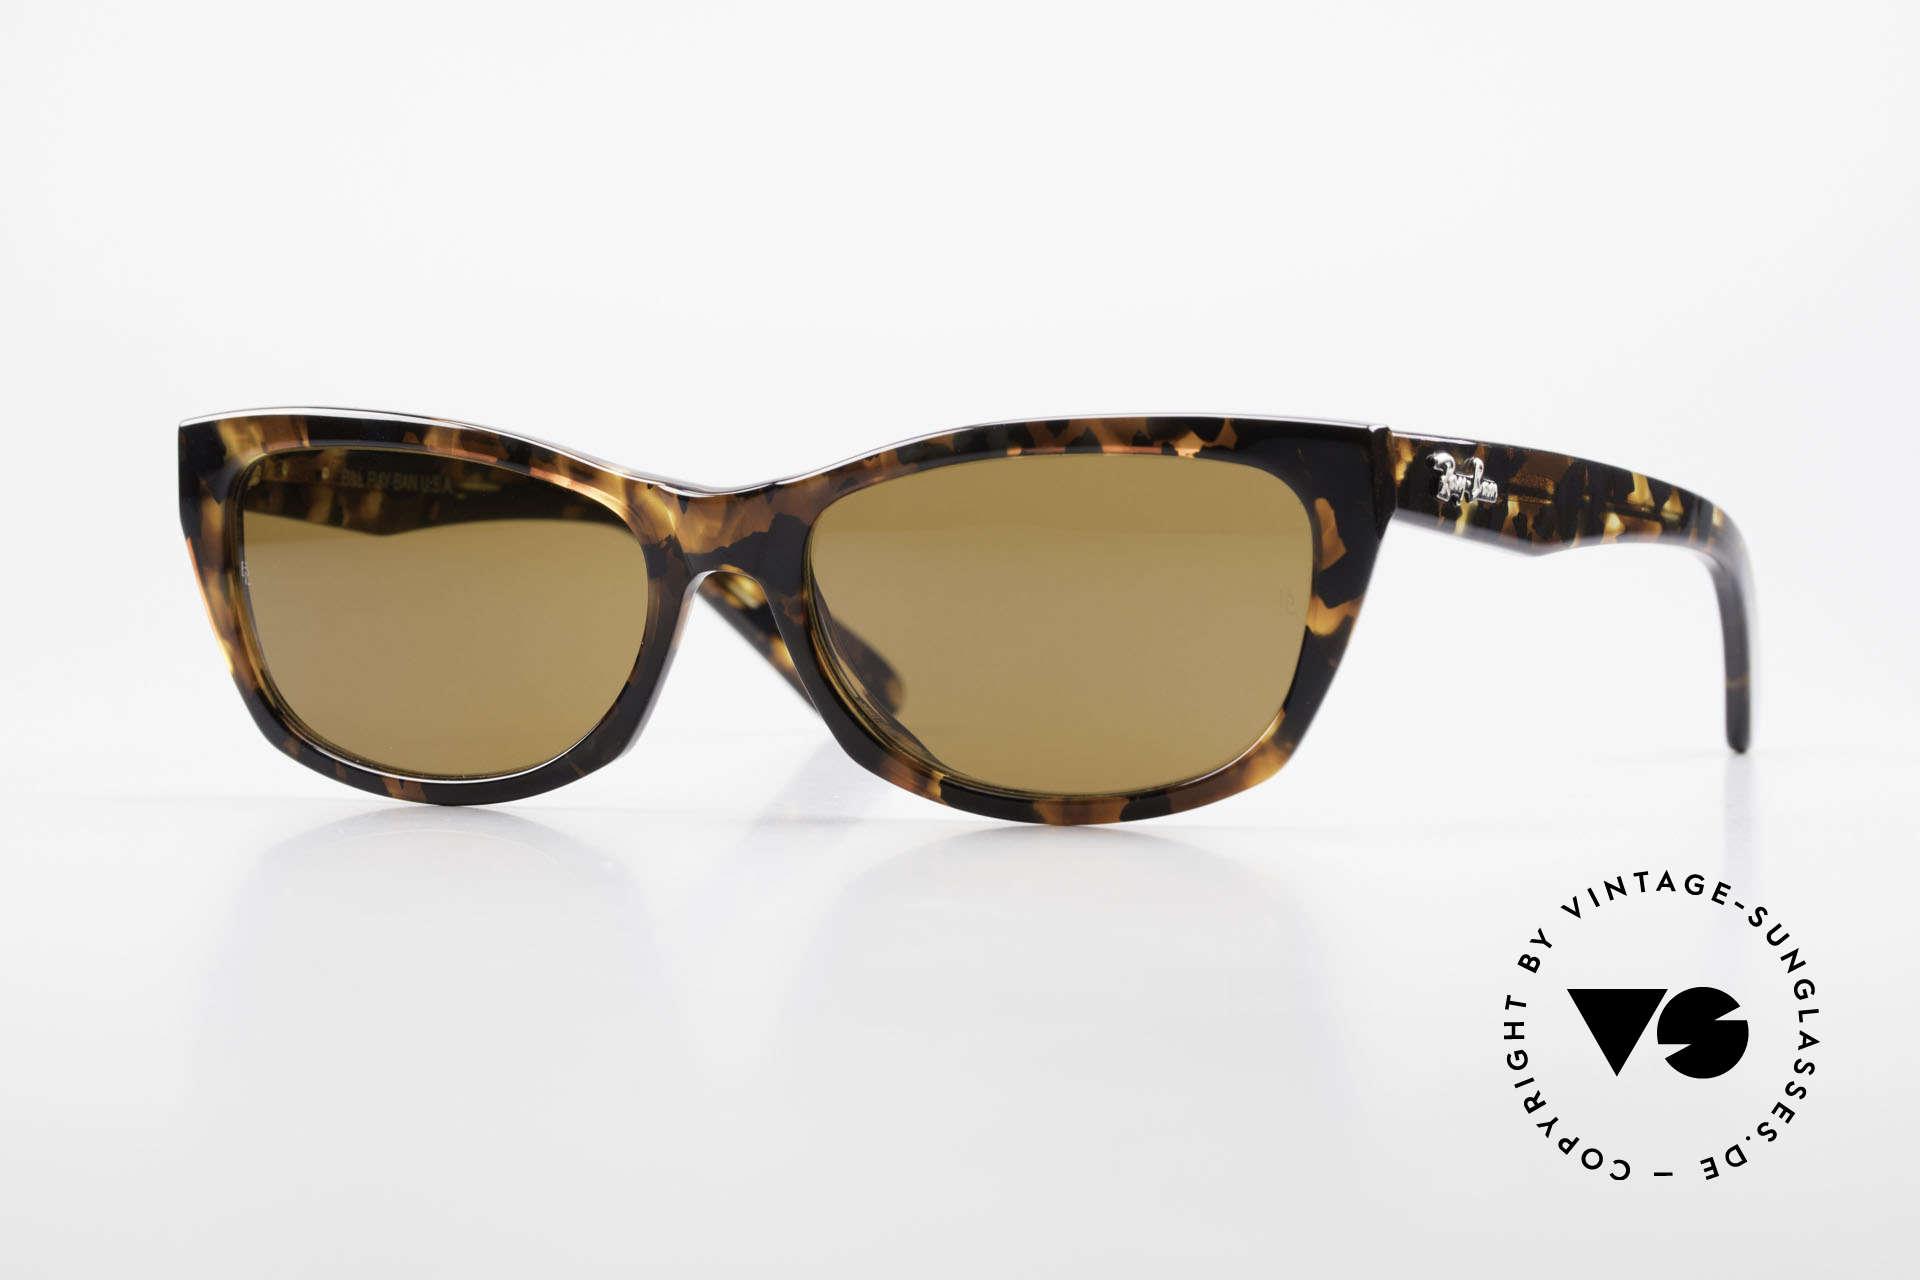 Ray Ban Innerview Alte B&L USA Sonnenbrille, USA RAY-BAN Sonnenbrille, W1438 Innerview, B15, Passend für Damen